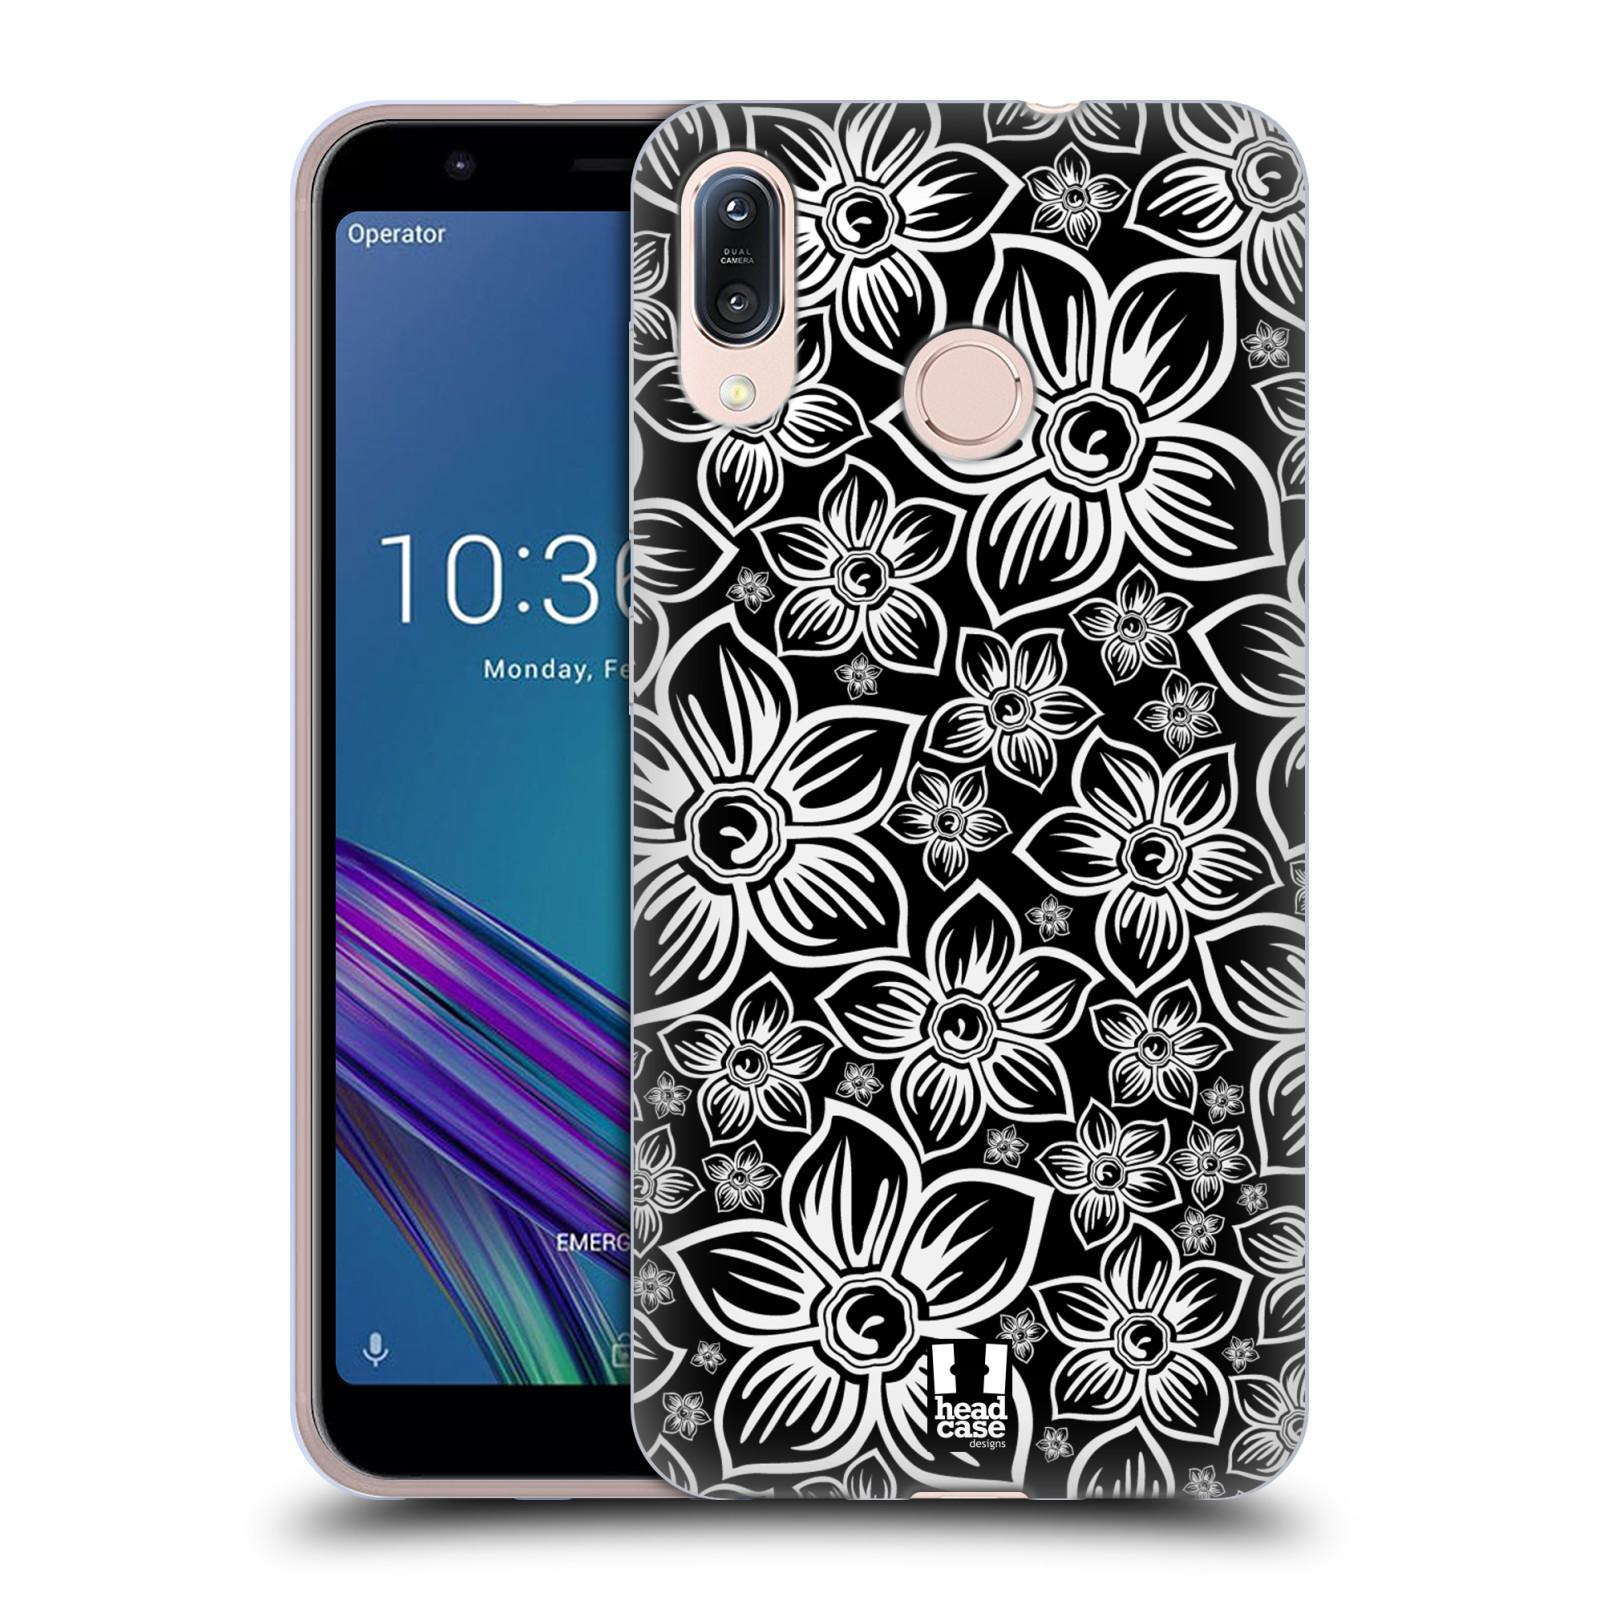 Silikonové pouzdro na mobil Asus Zenfone Max M1 ZB555KL - Head Case - FLORAL DAISY